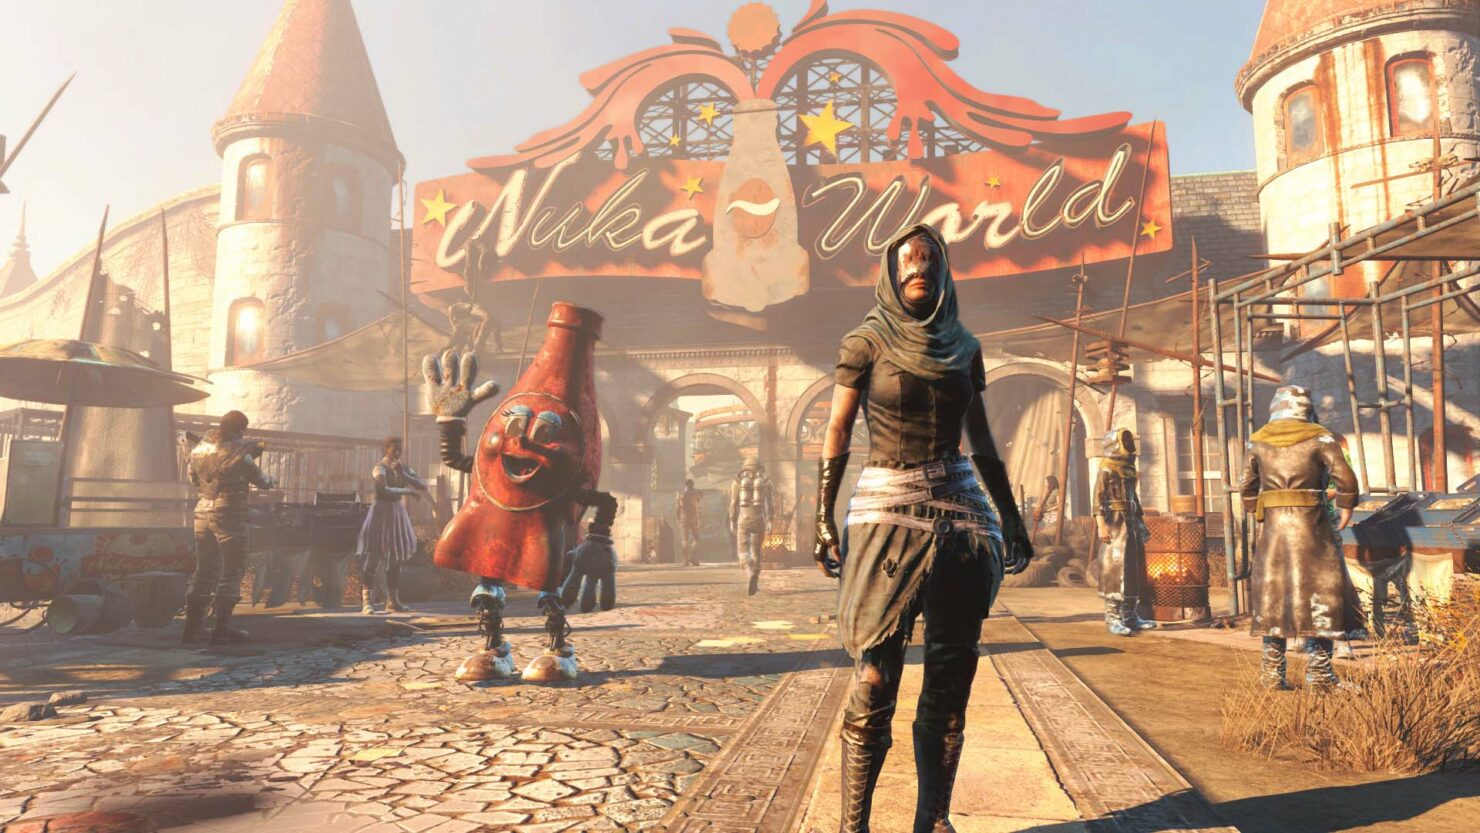 Fallout 4 Update 1.5.4